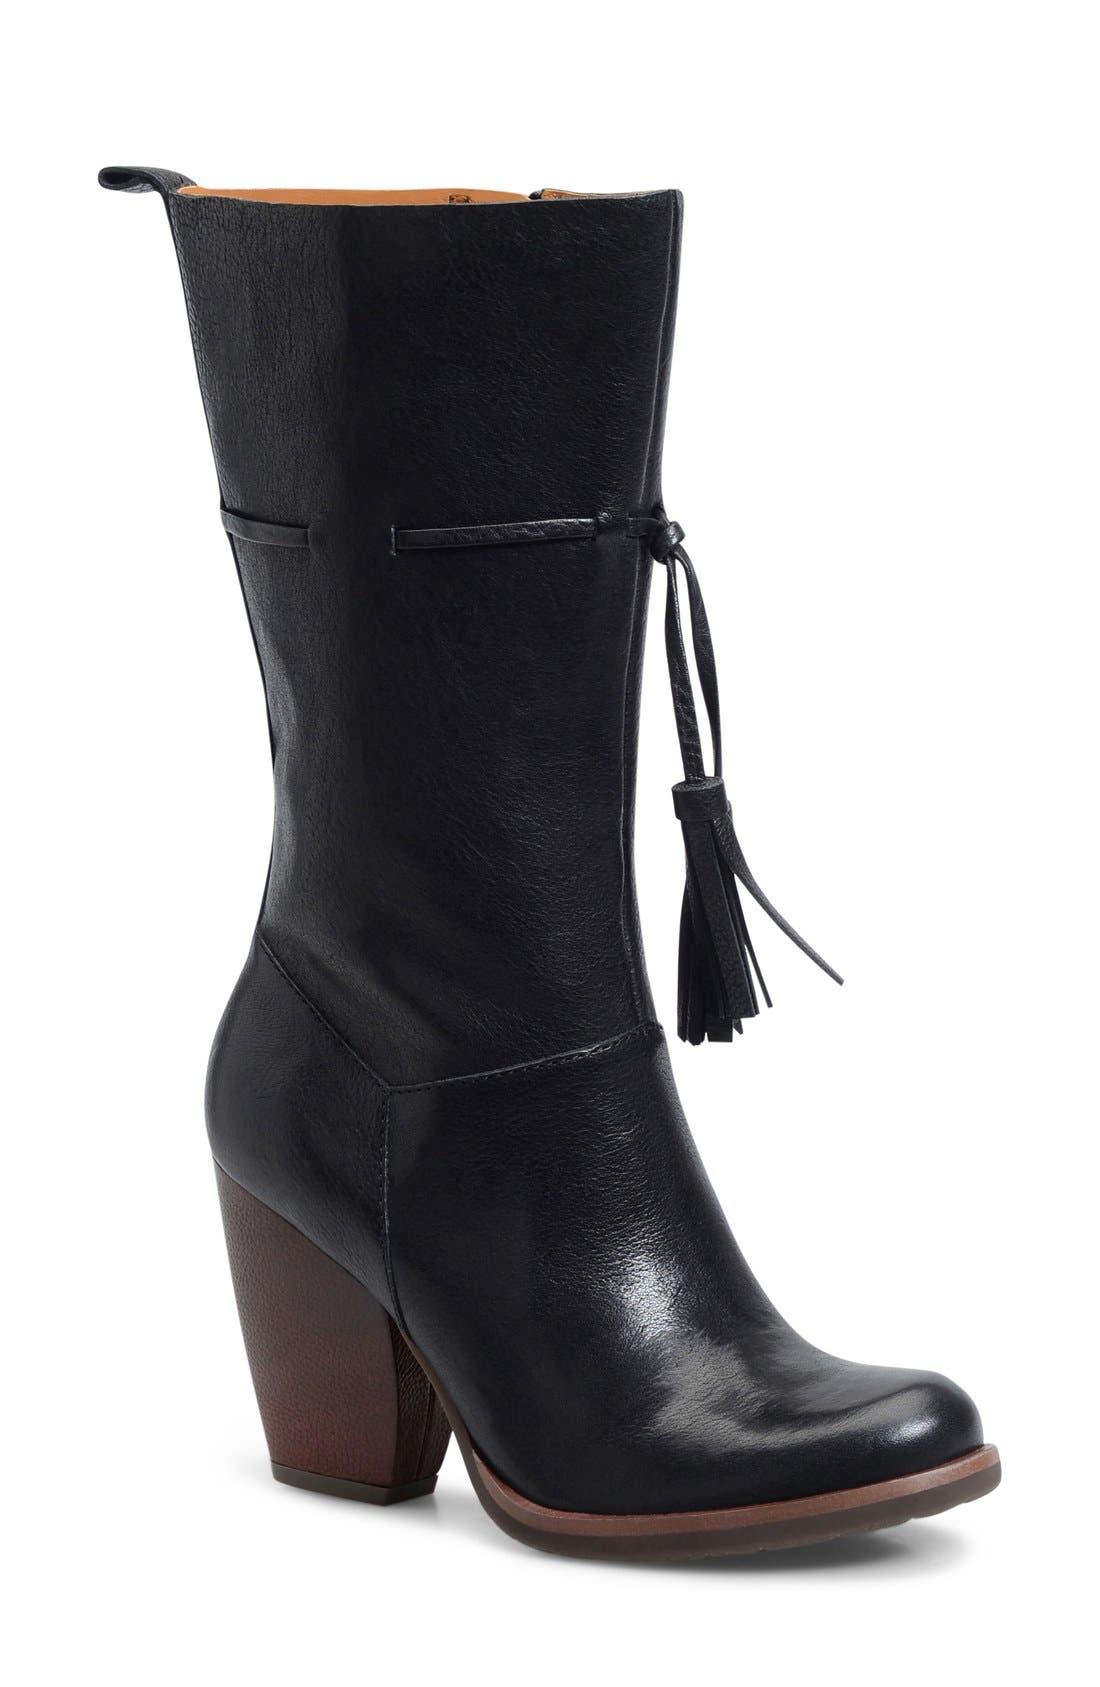 Alternate Image 1 Selected - Kork-Ease® 'Umbriel' Boot (Women)